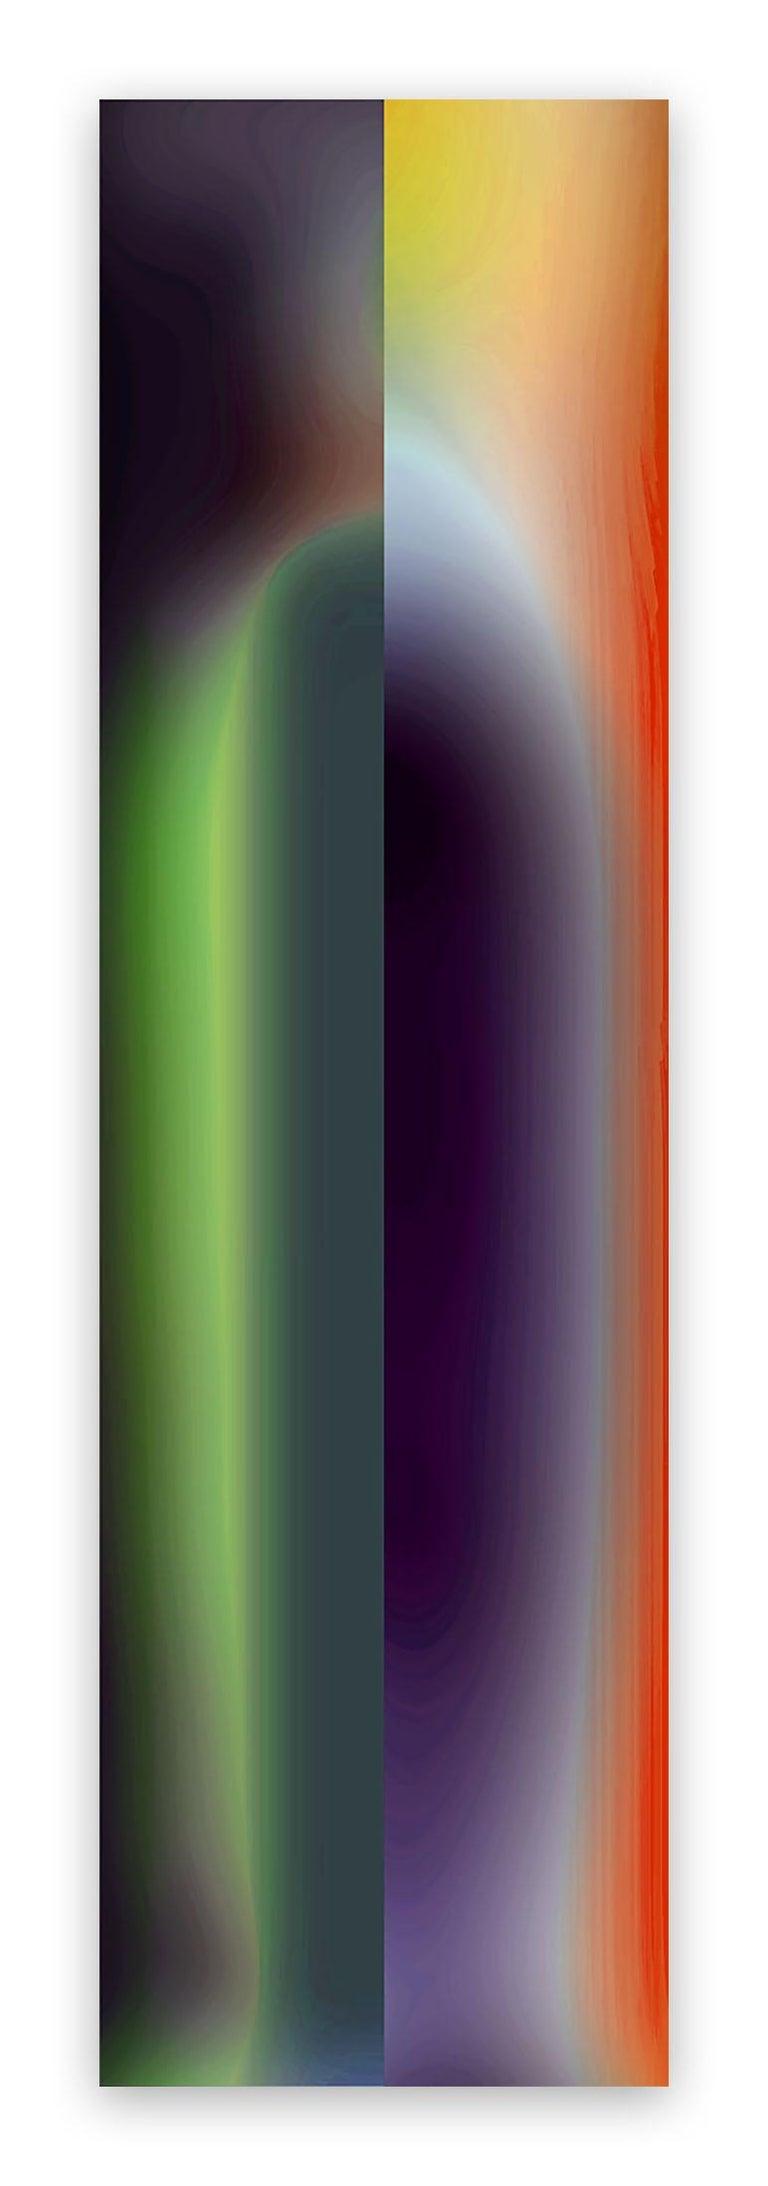 Bill Kane Abstract Photograph - EMDL-6